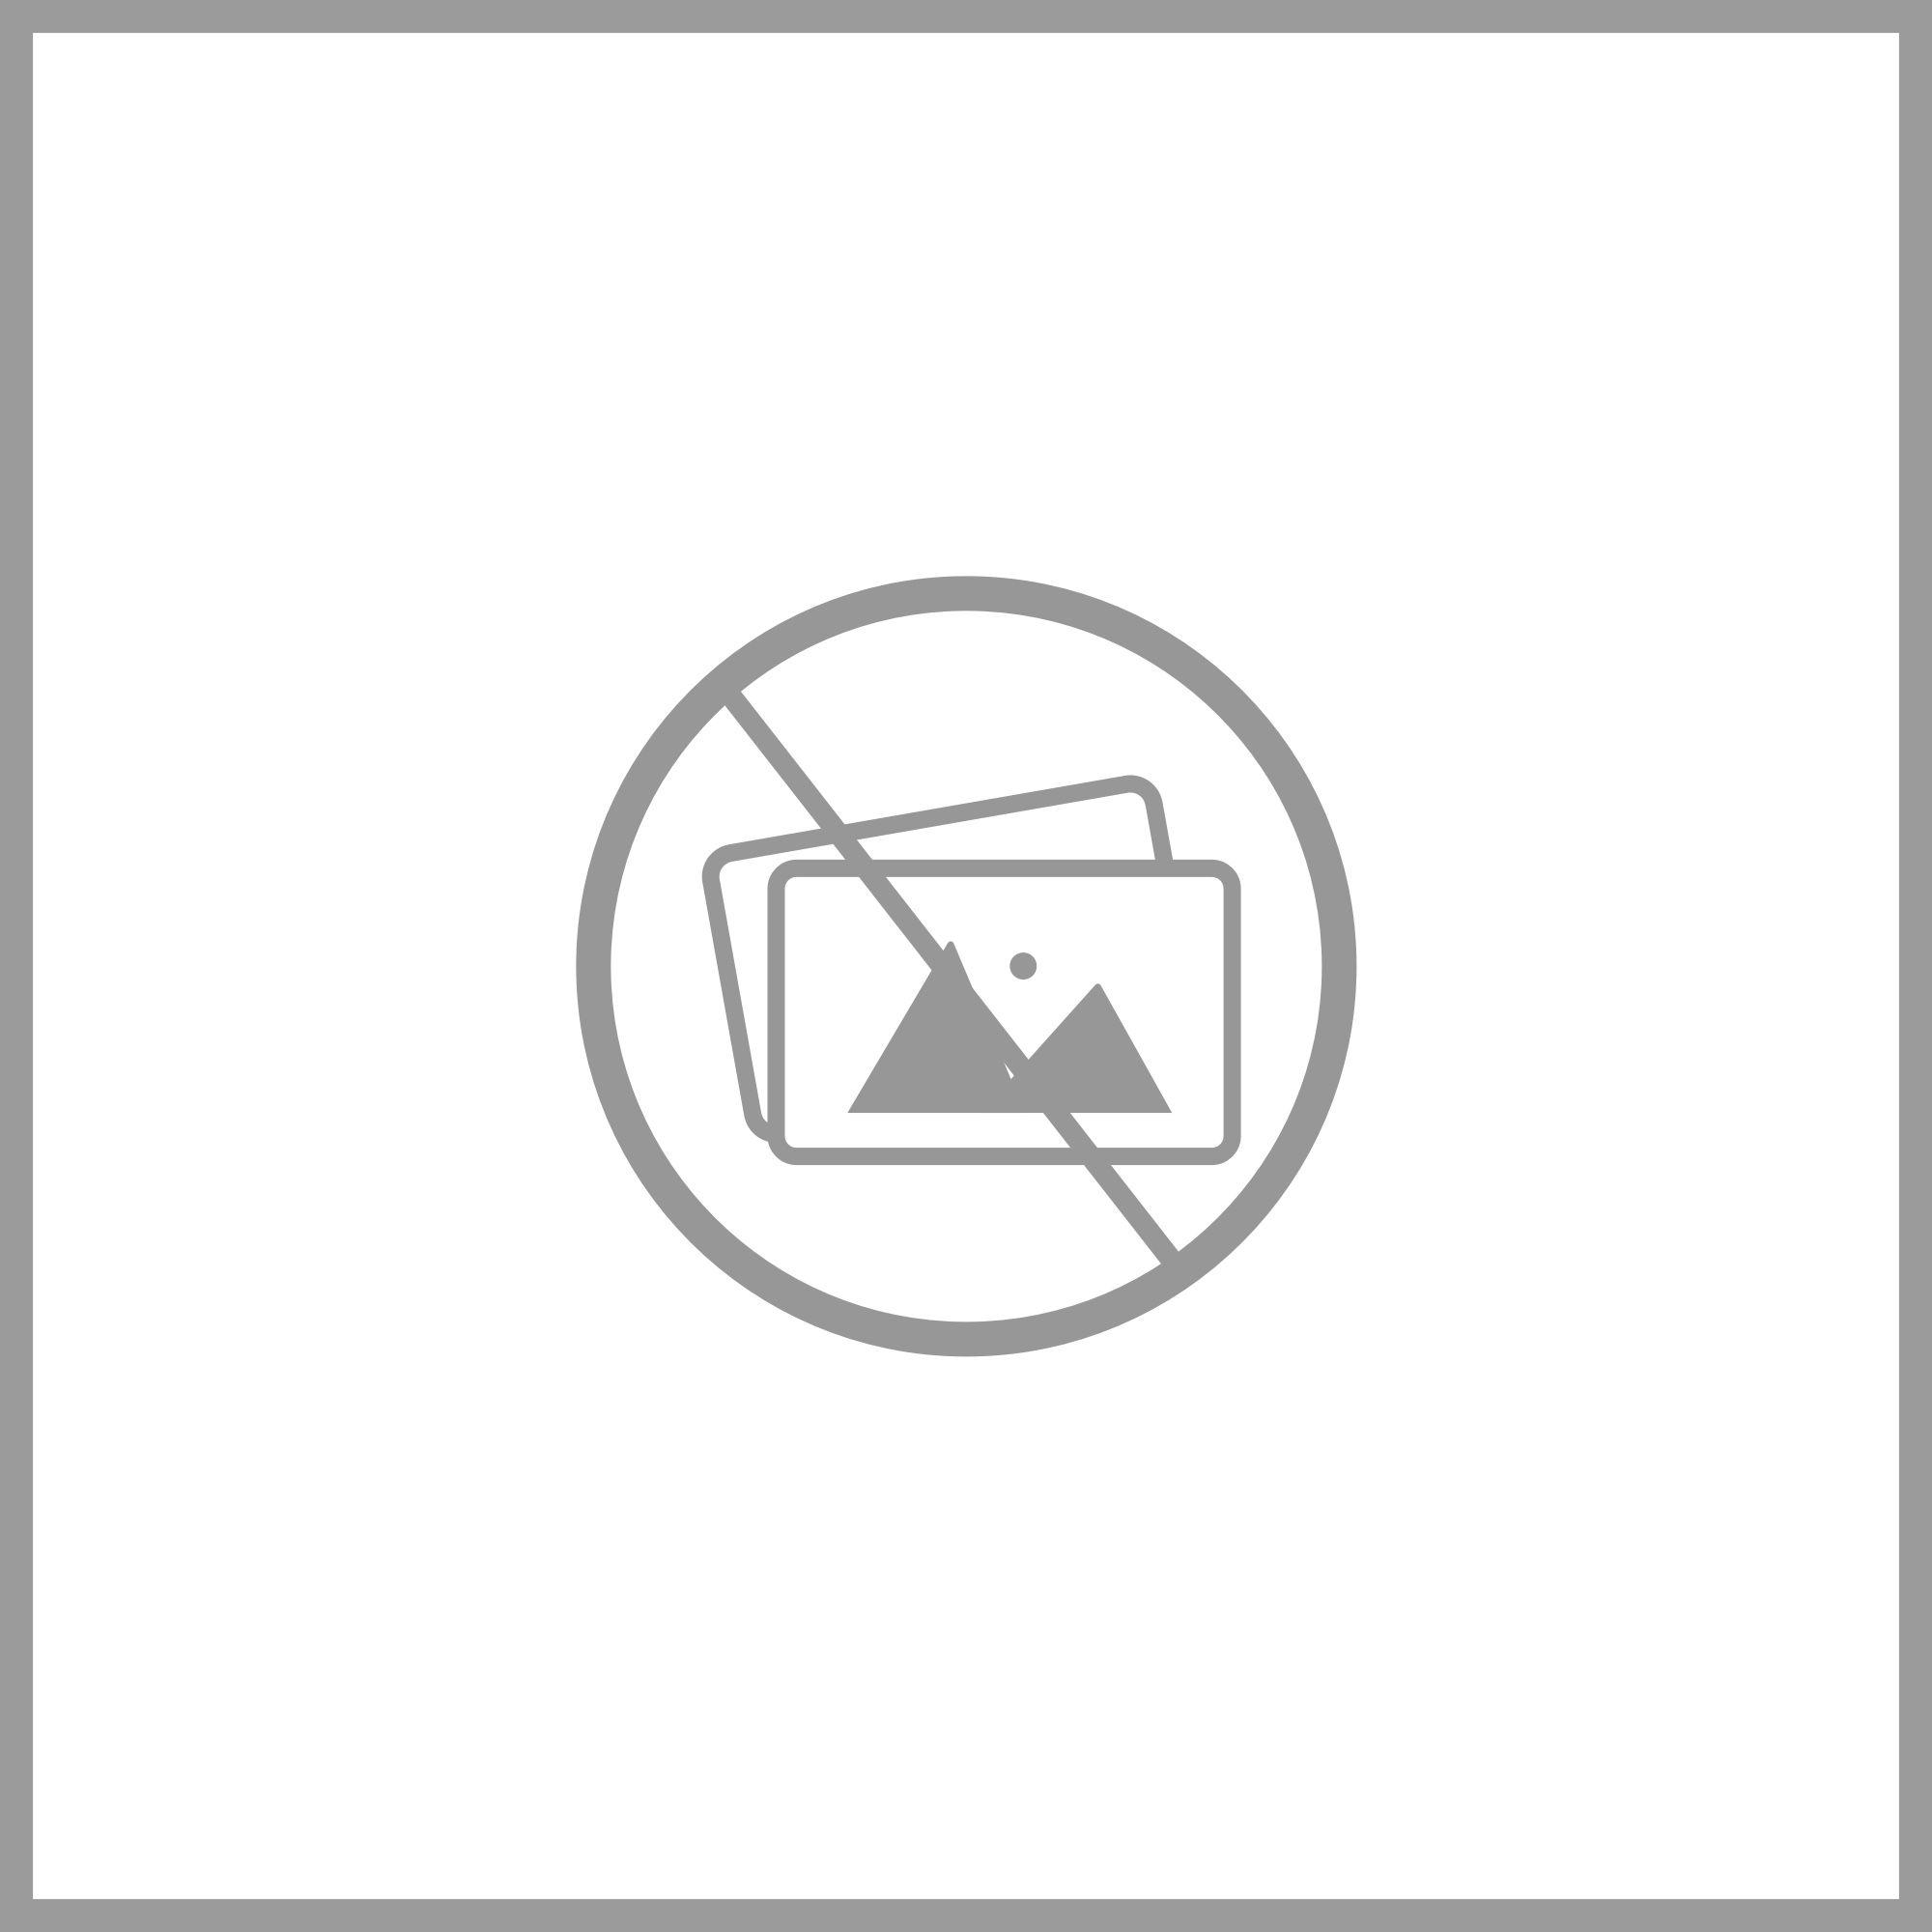 loft insulation bandq. 0:00 / loft insulation bandq